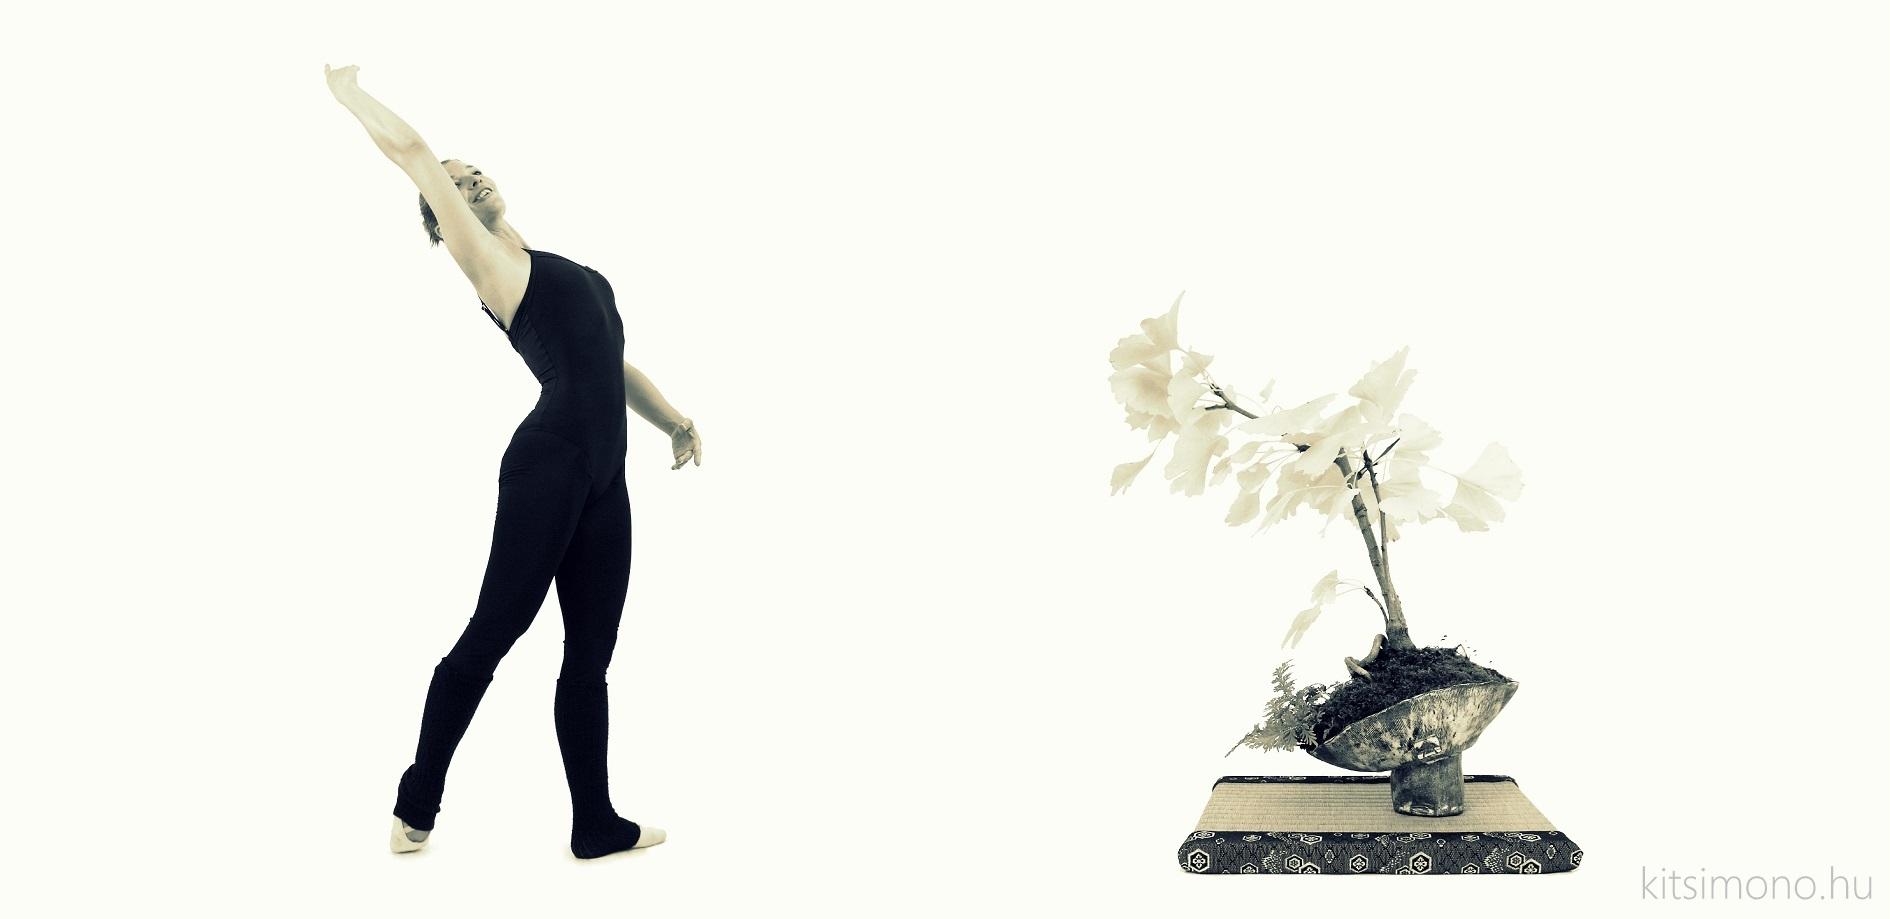 ginkgo biloba literati bunjin bonsai ballet kitsimono art studio (2)